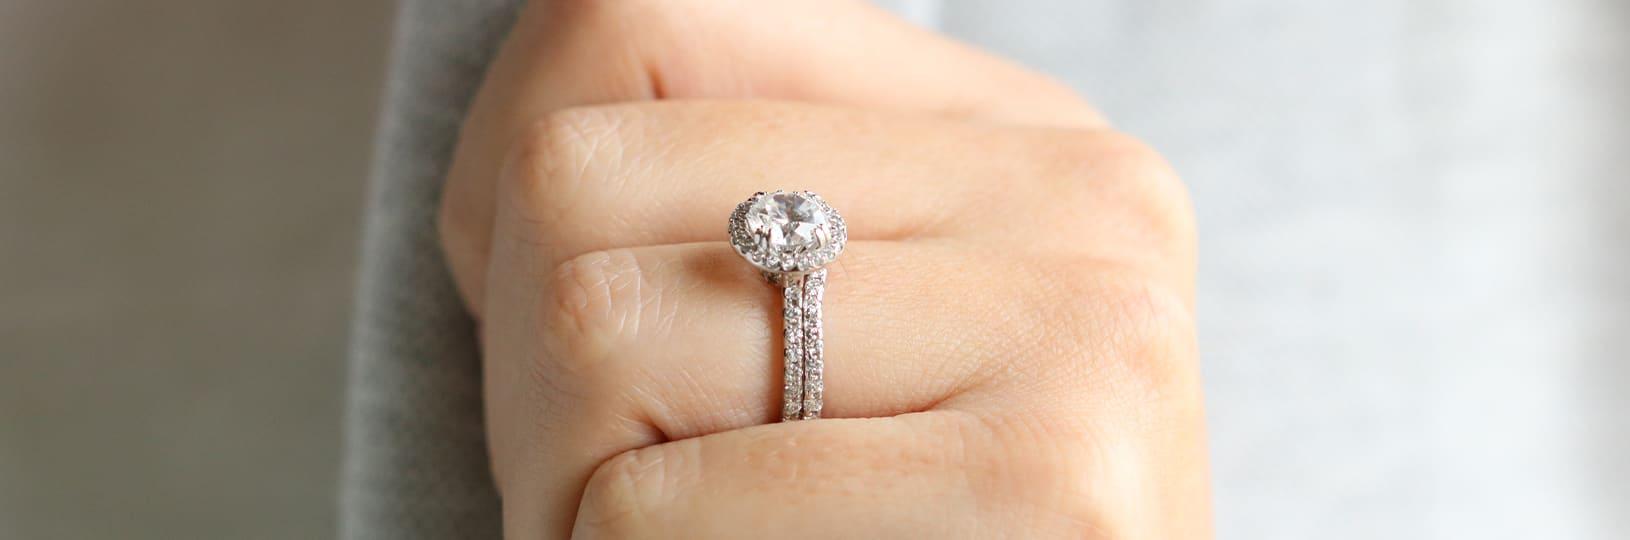 Lab diamond engagement ring